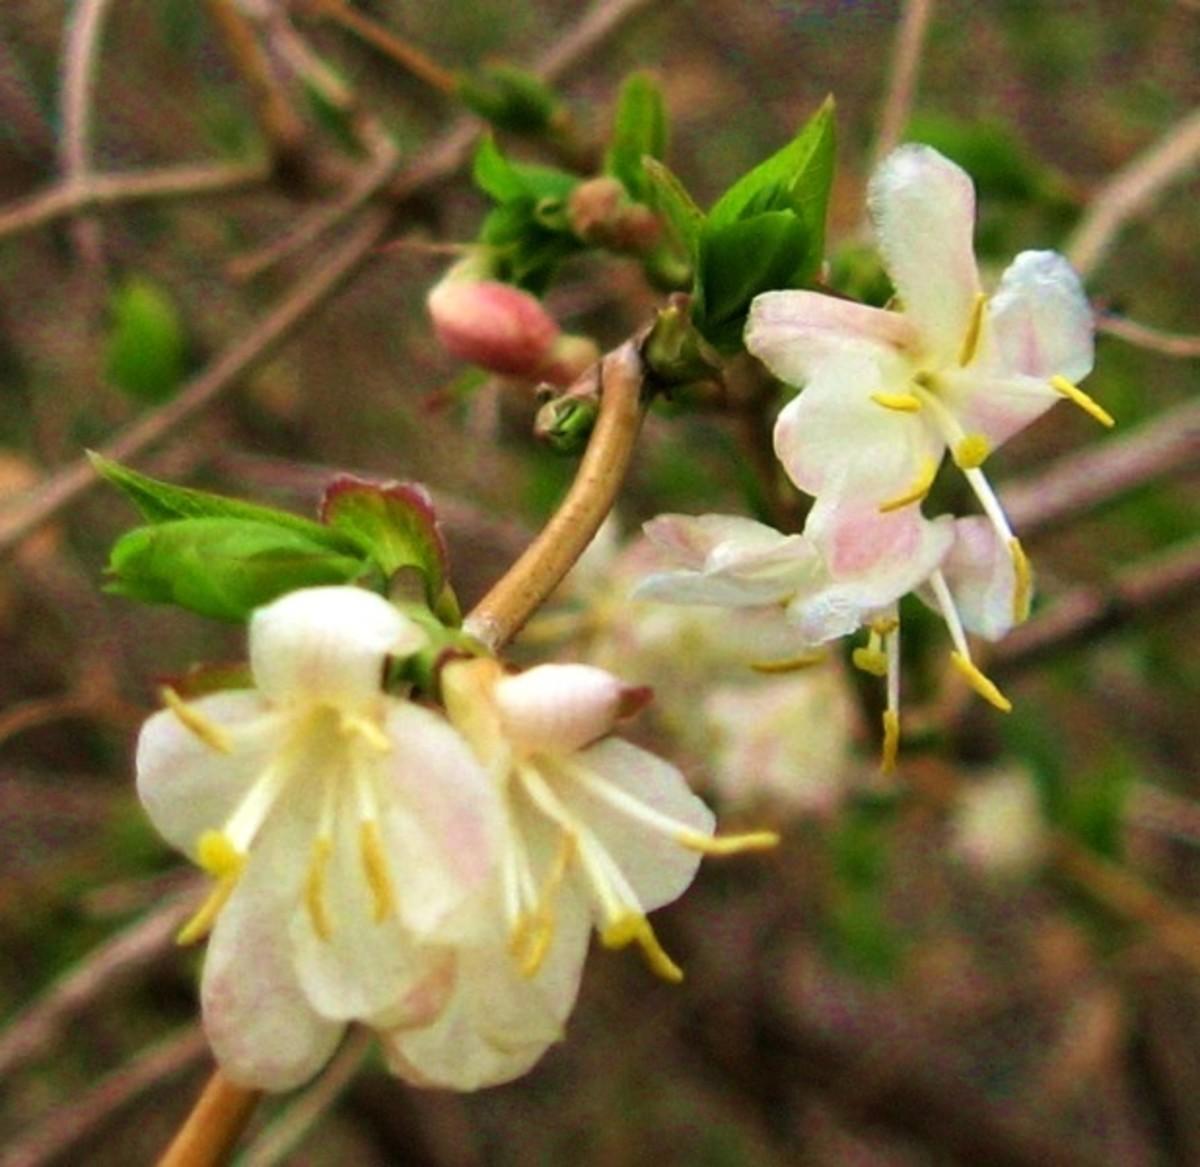 Fragrant winter honeysuckle in bloom.